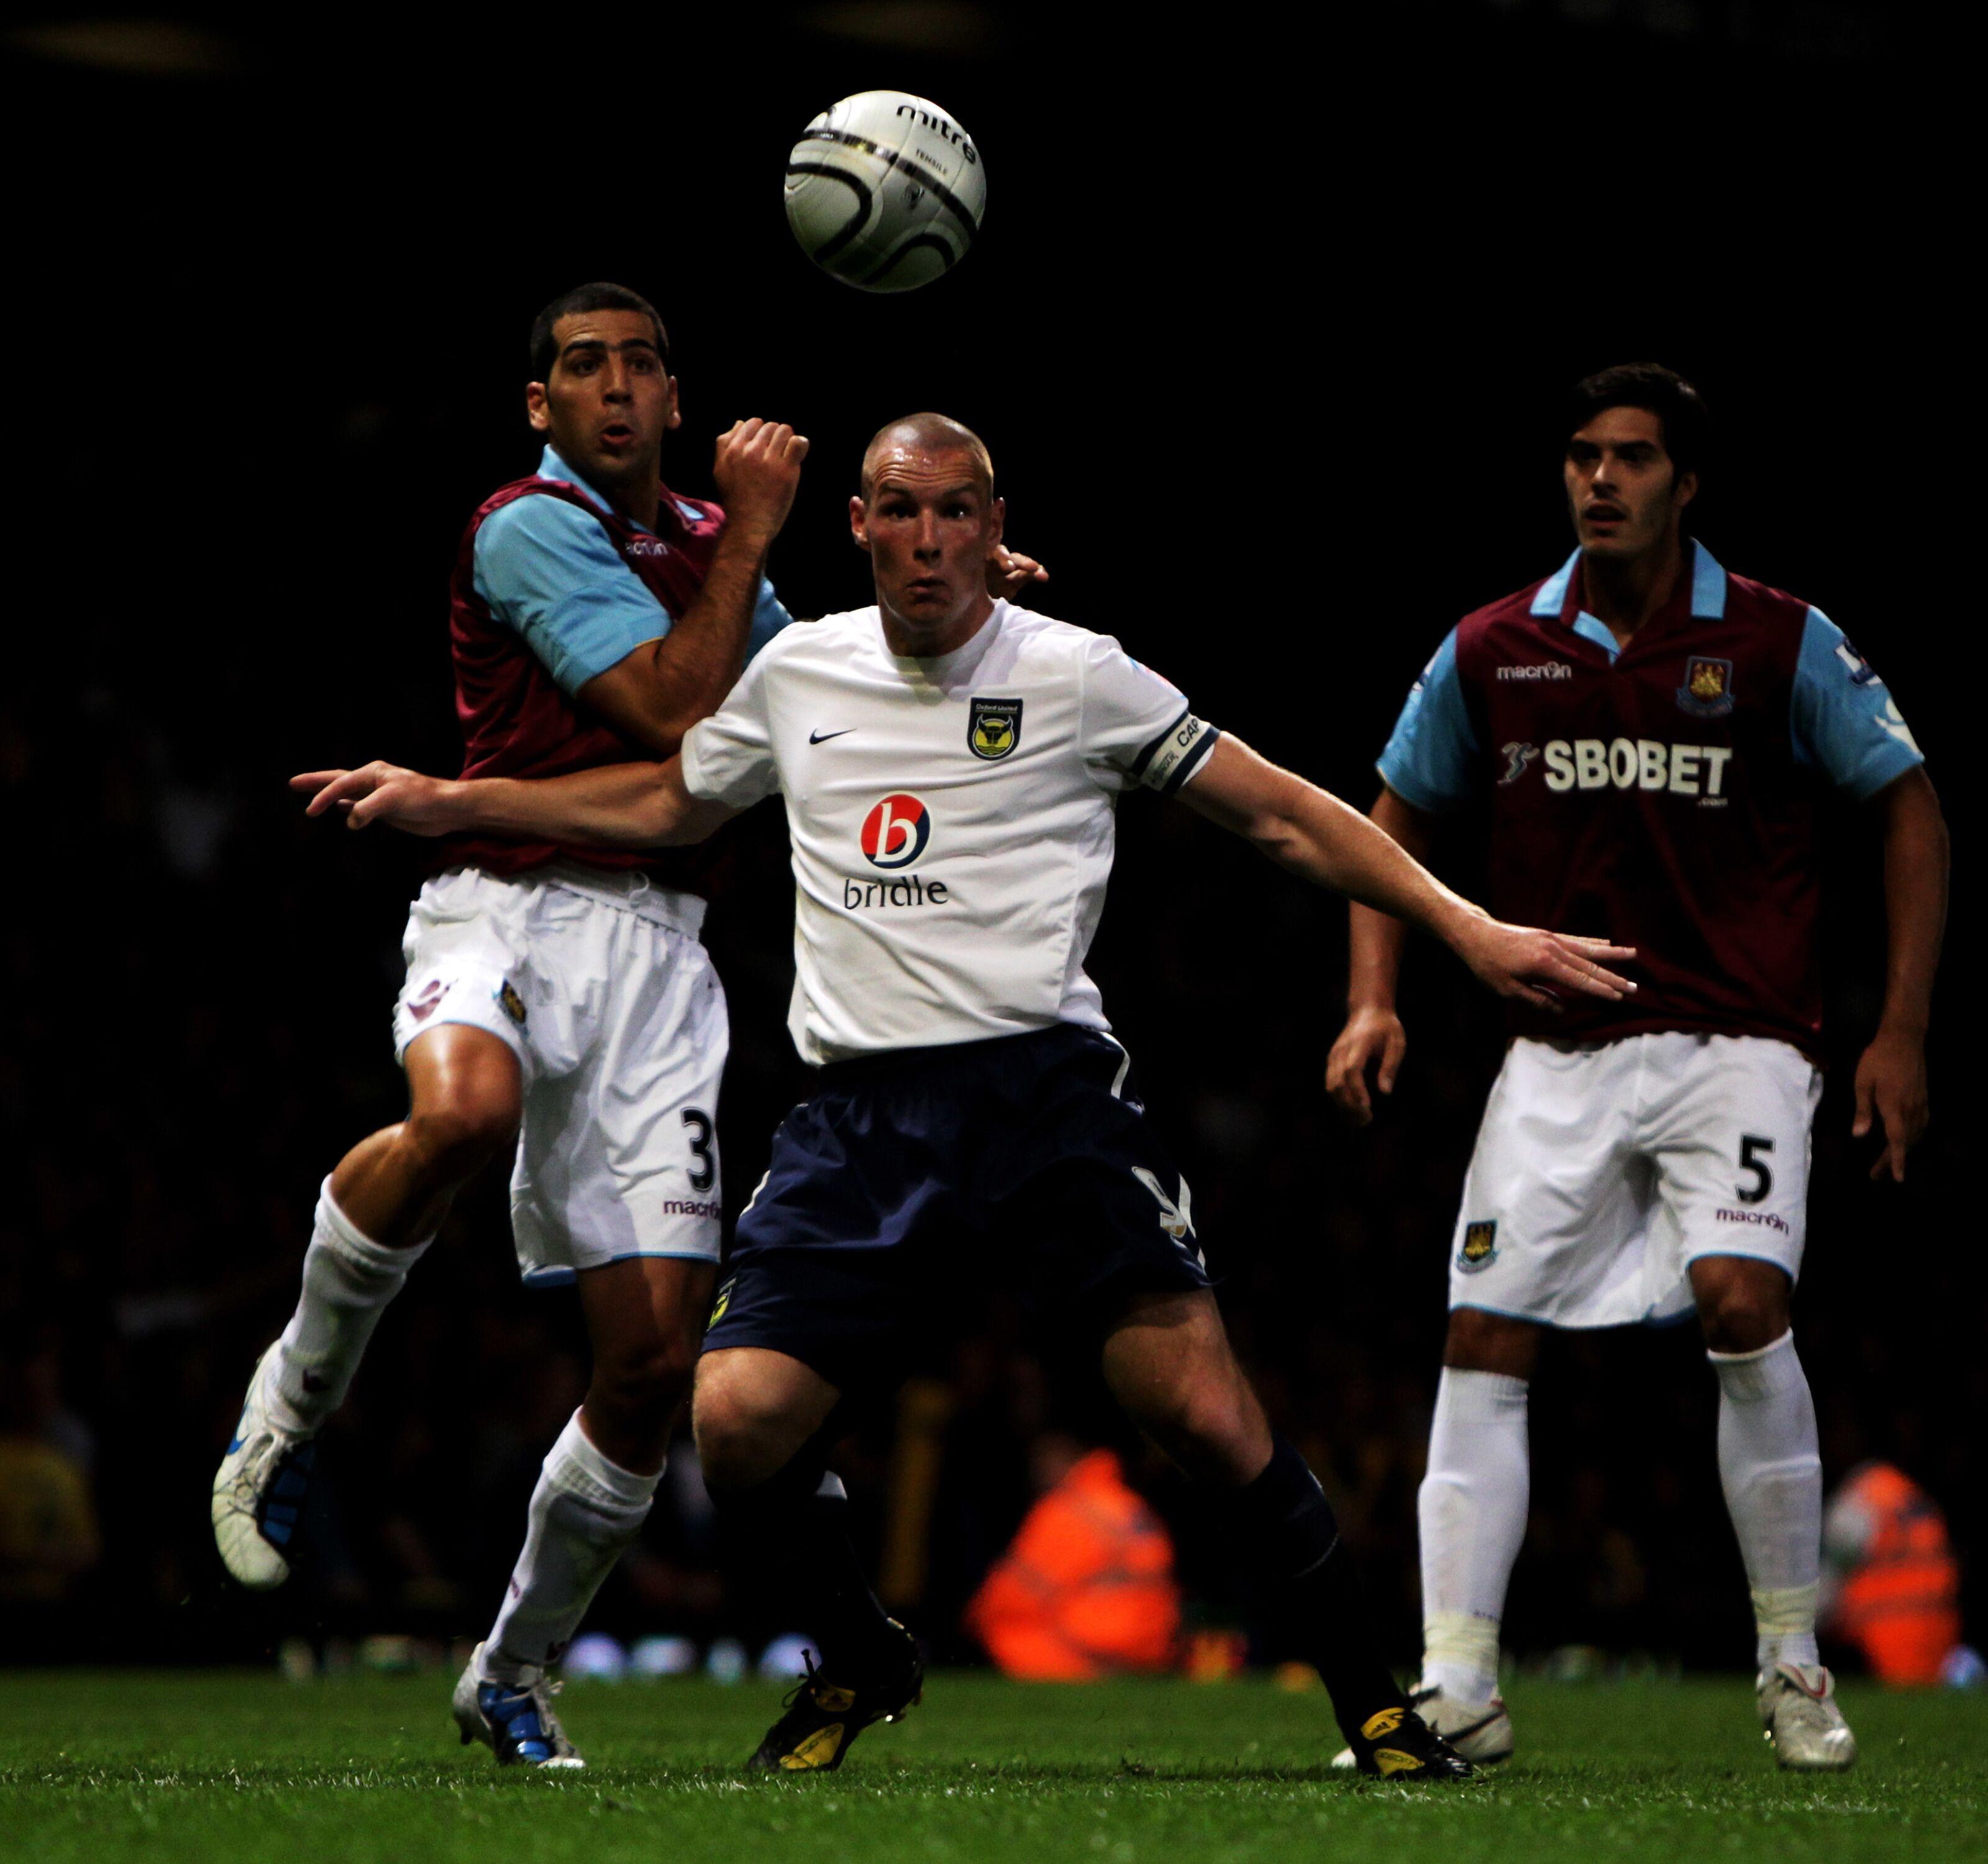 The Delorean Chronicles: West Ham United vs Oxford United